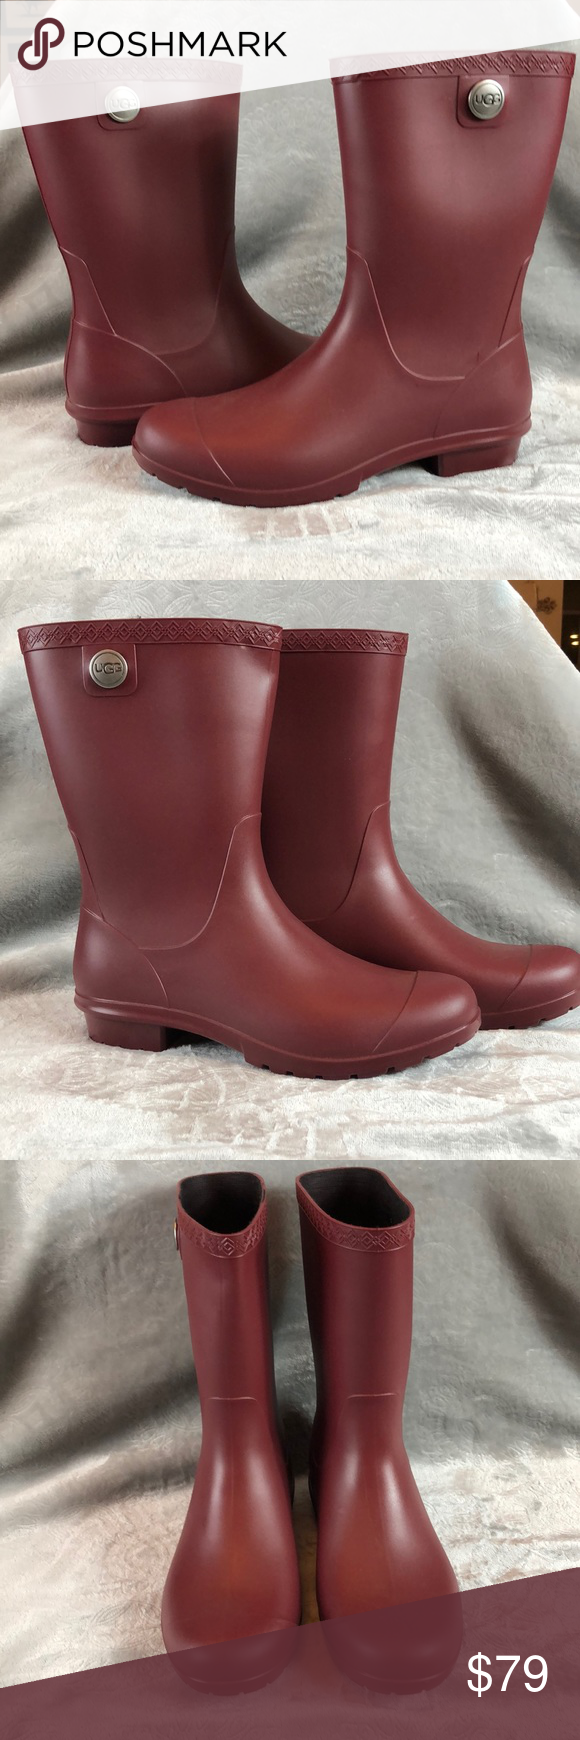 95f24638333 UGG Sienna Matt Rain boots size 8 Garnet NWT Brand new never worn ...